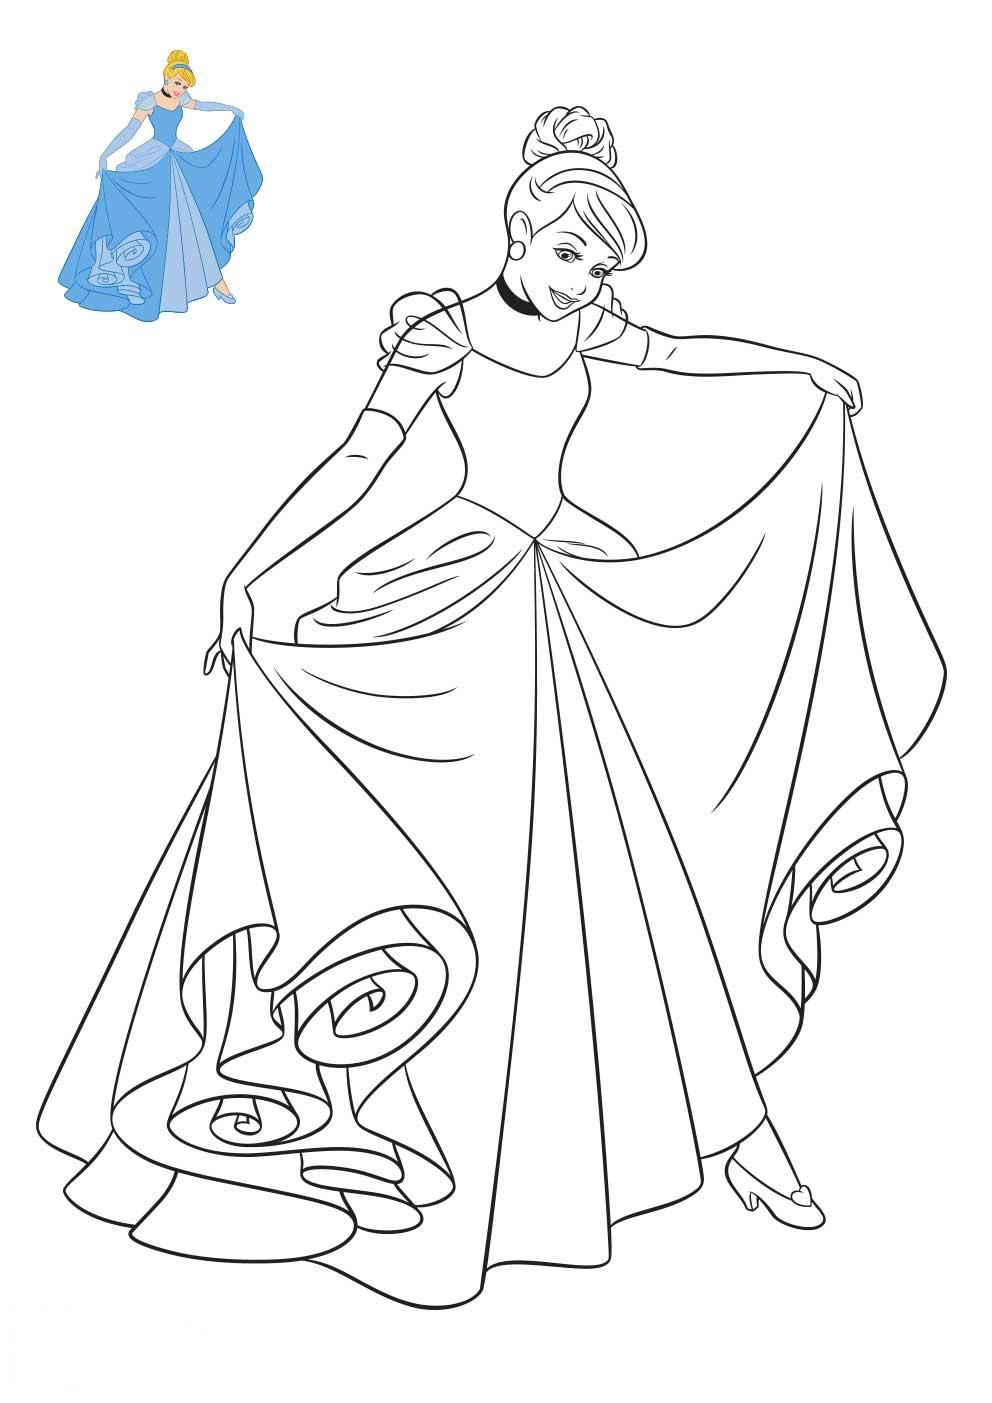 Coloriage Princesses Disney Coloriage Princesse Disney Coloriage Princesse Coloriage Cendrillon